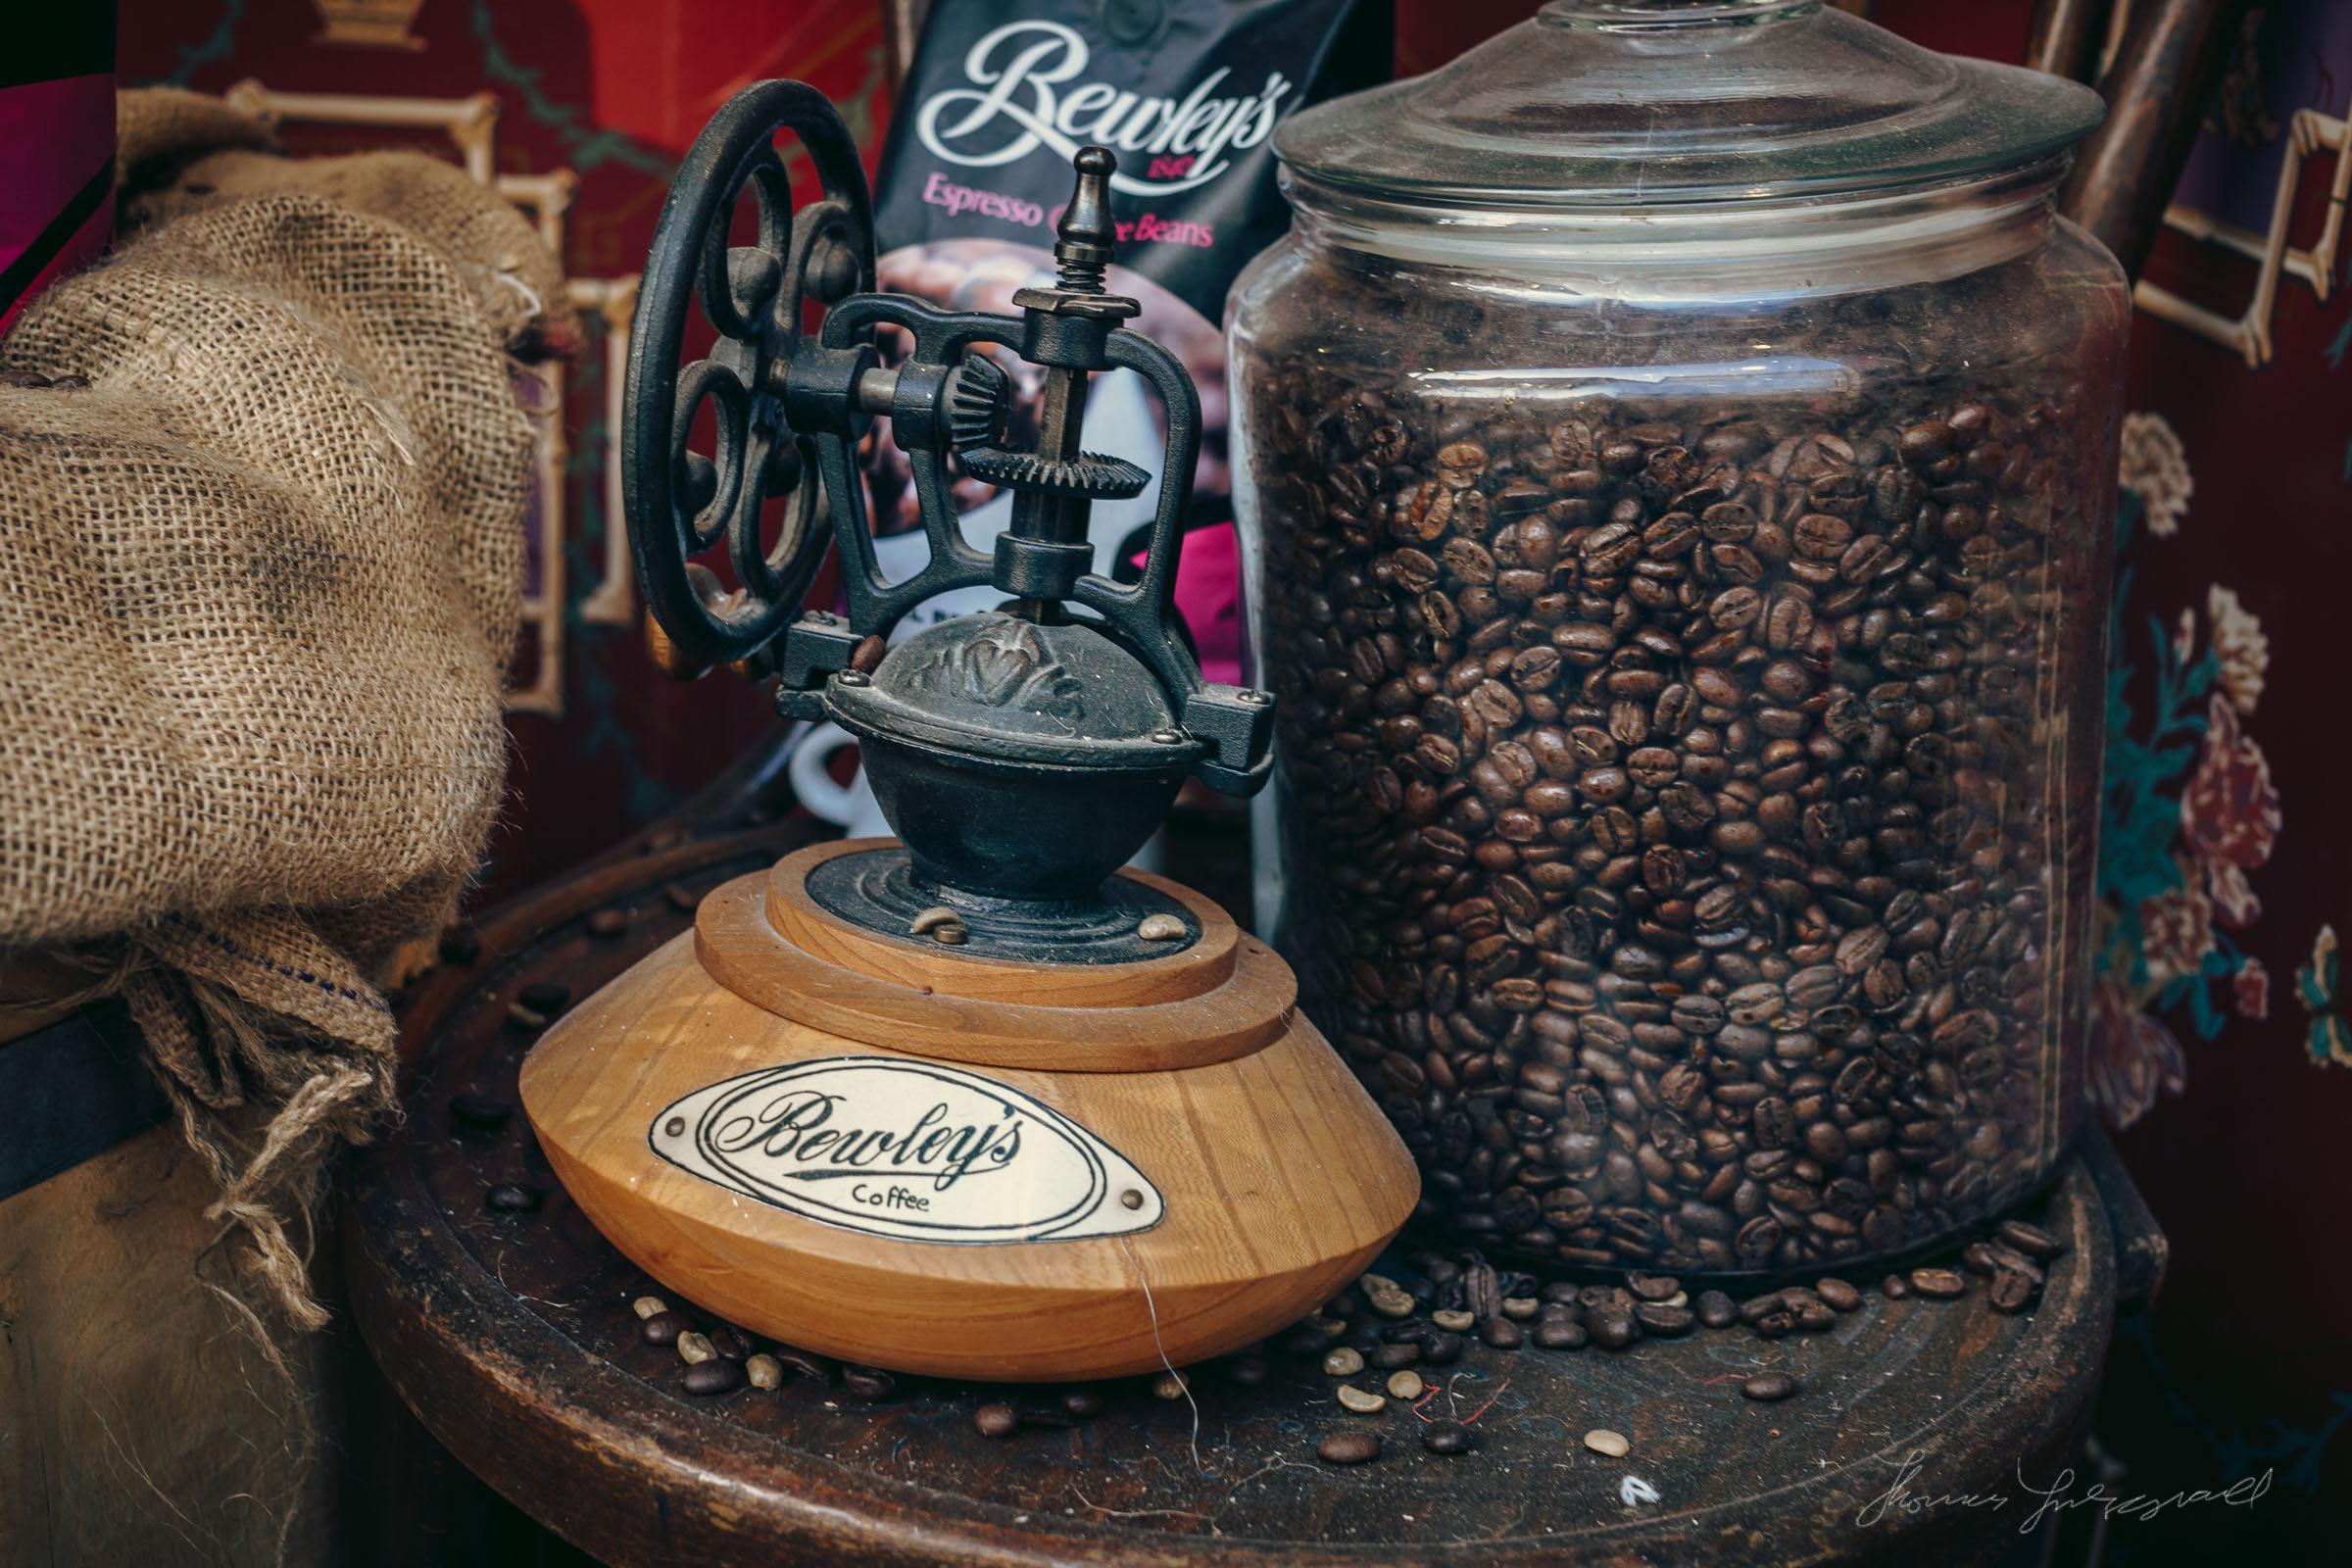 Coffee Tones - Lightroom Presets in Action